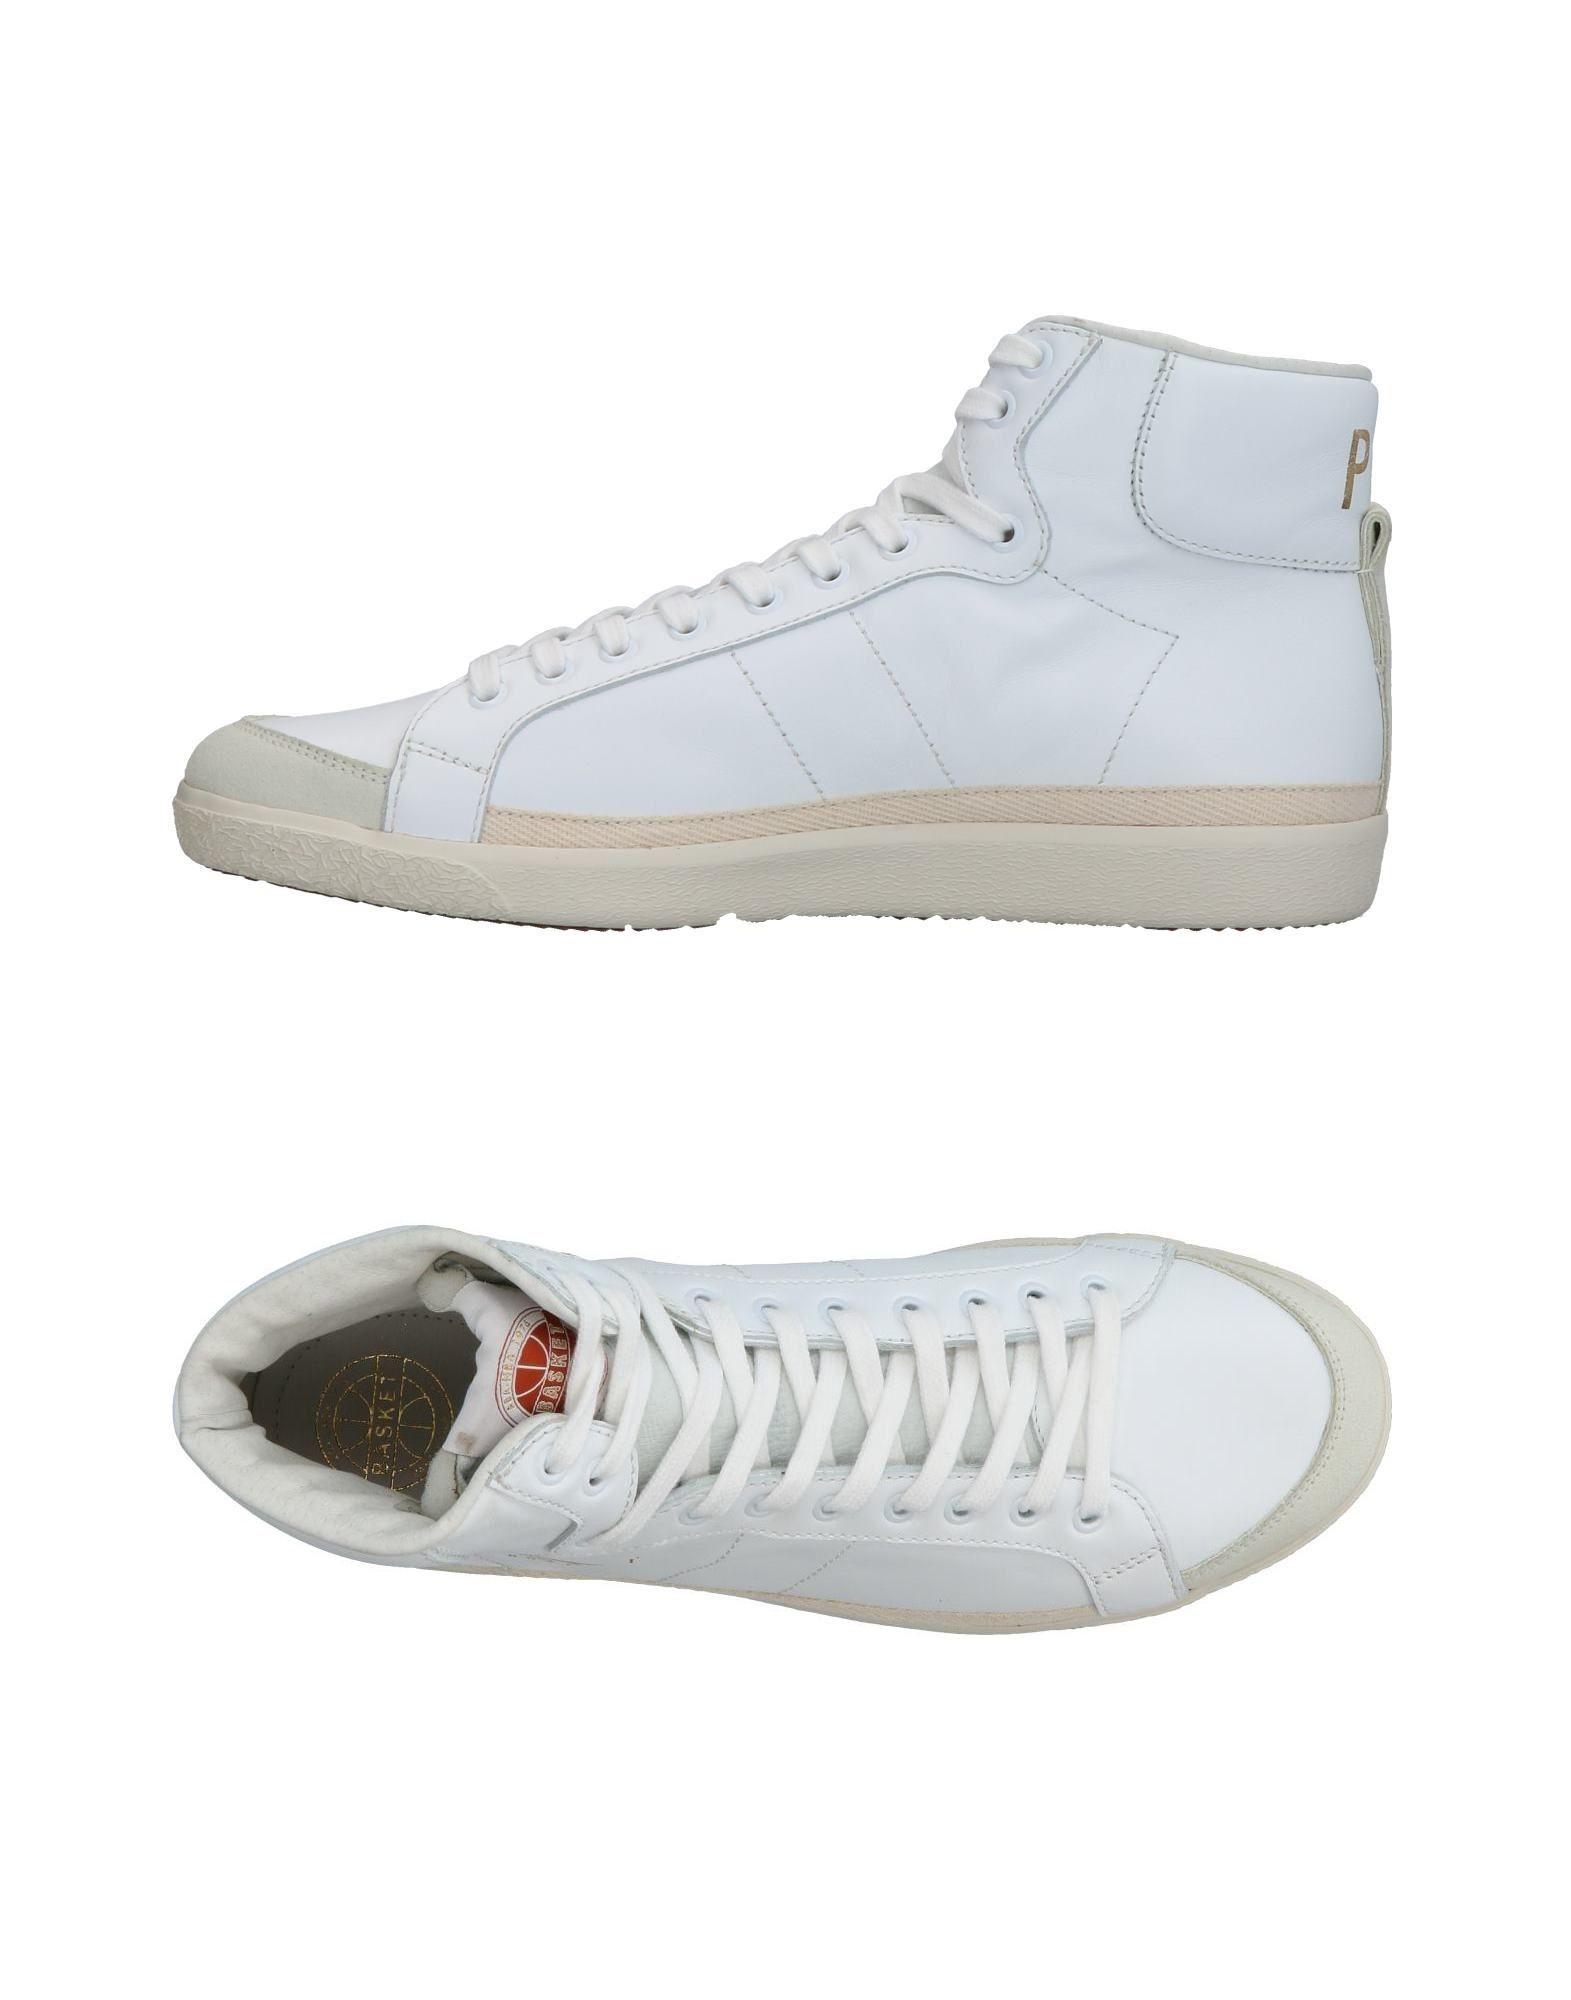 Sneakers Pantofola Doro Homme - Sneakers Pantofola Doro sur